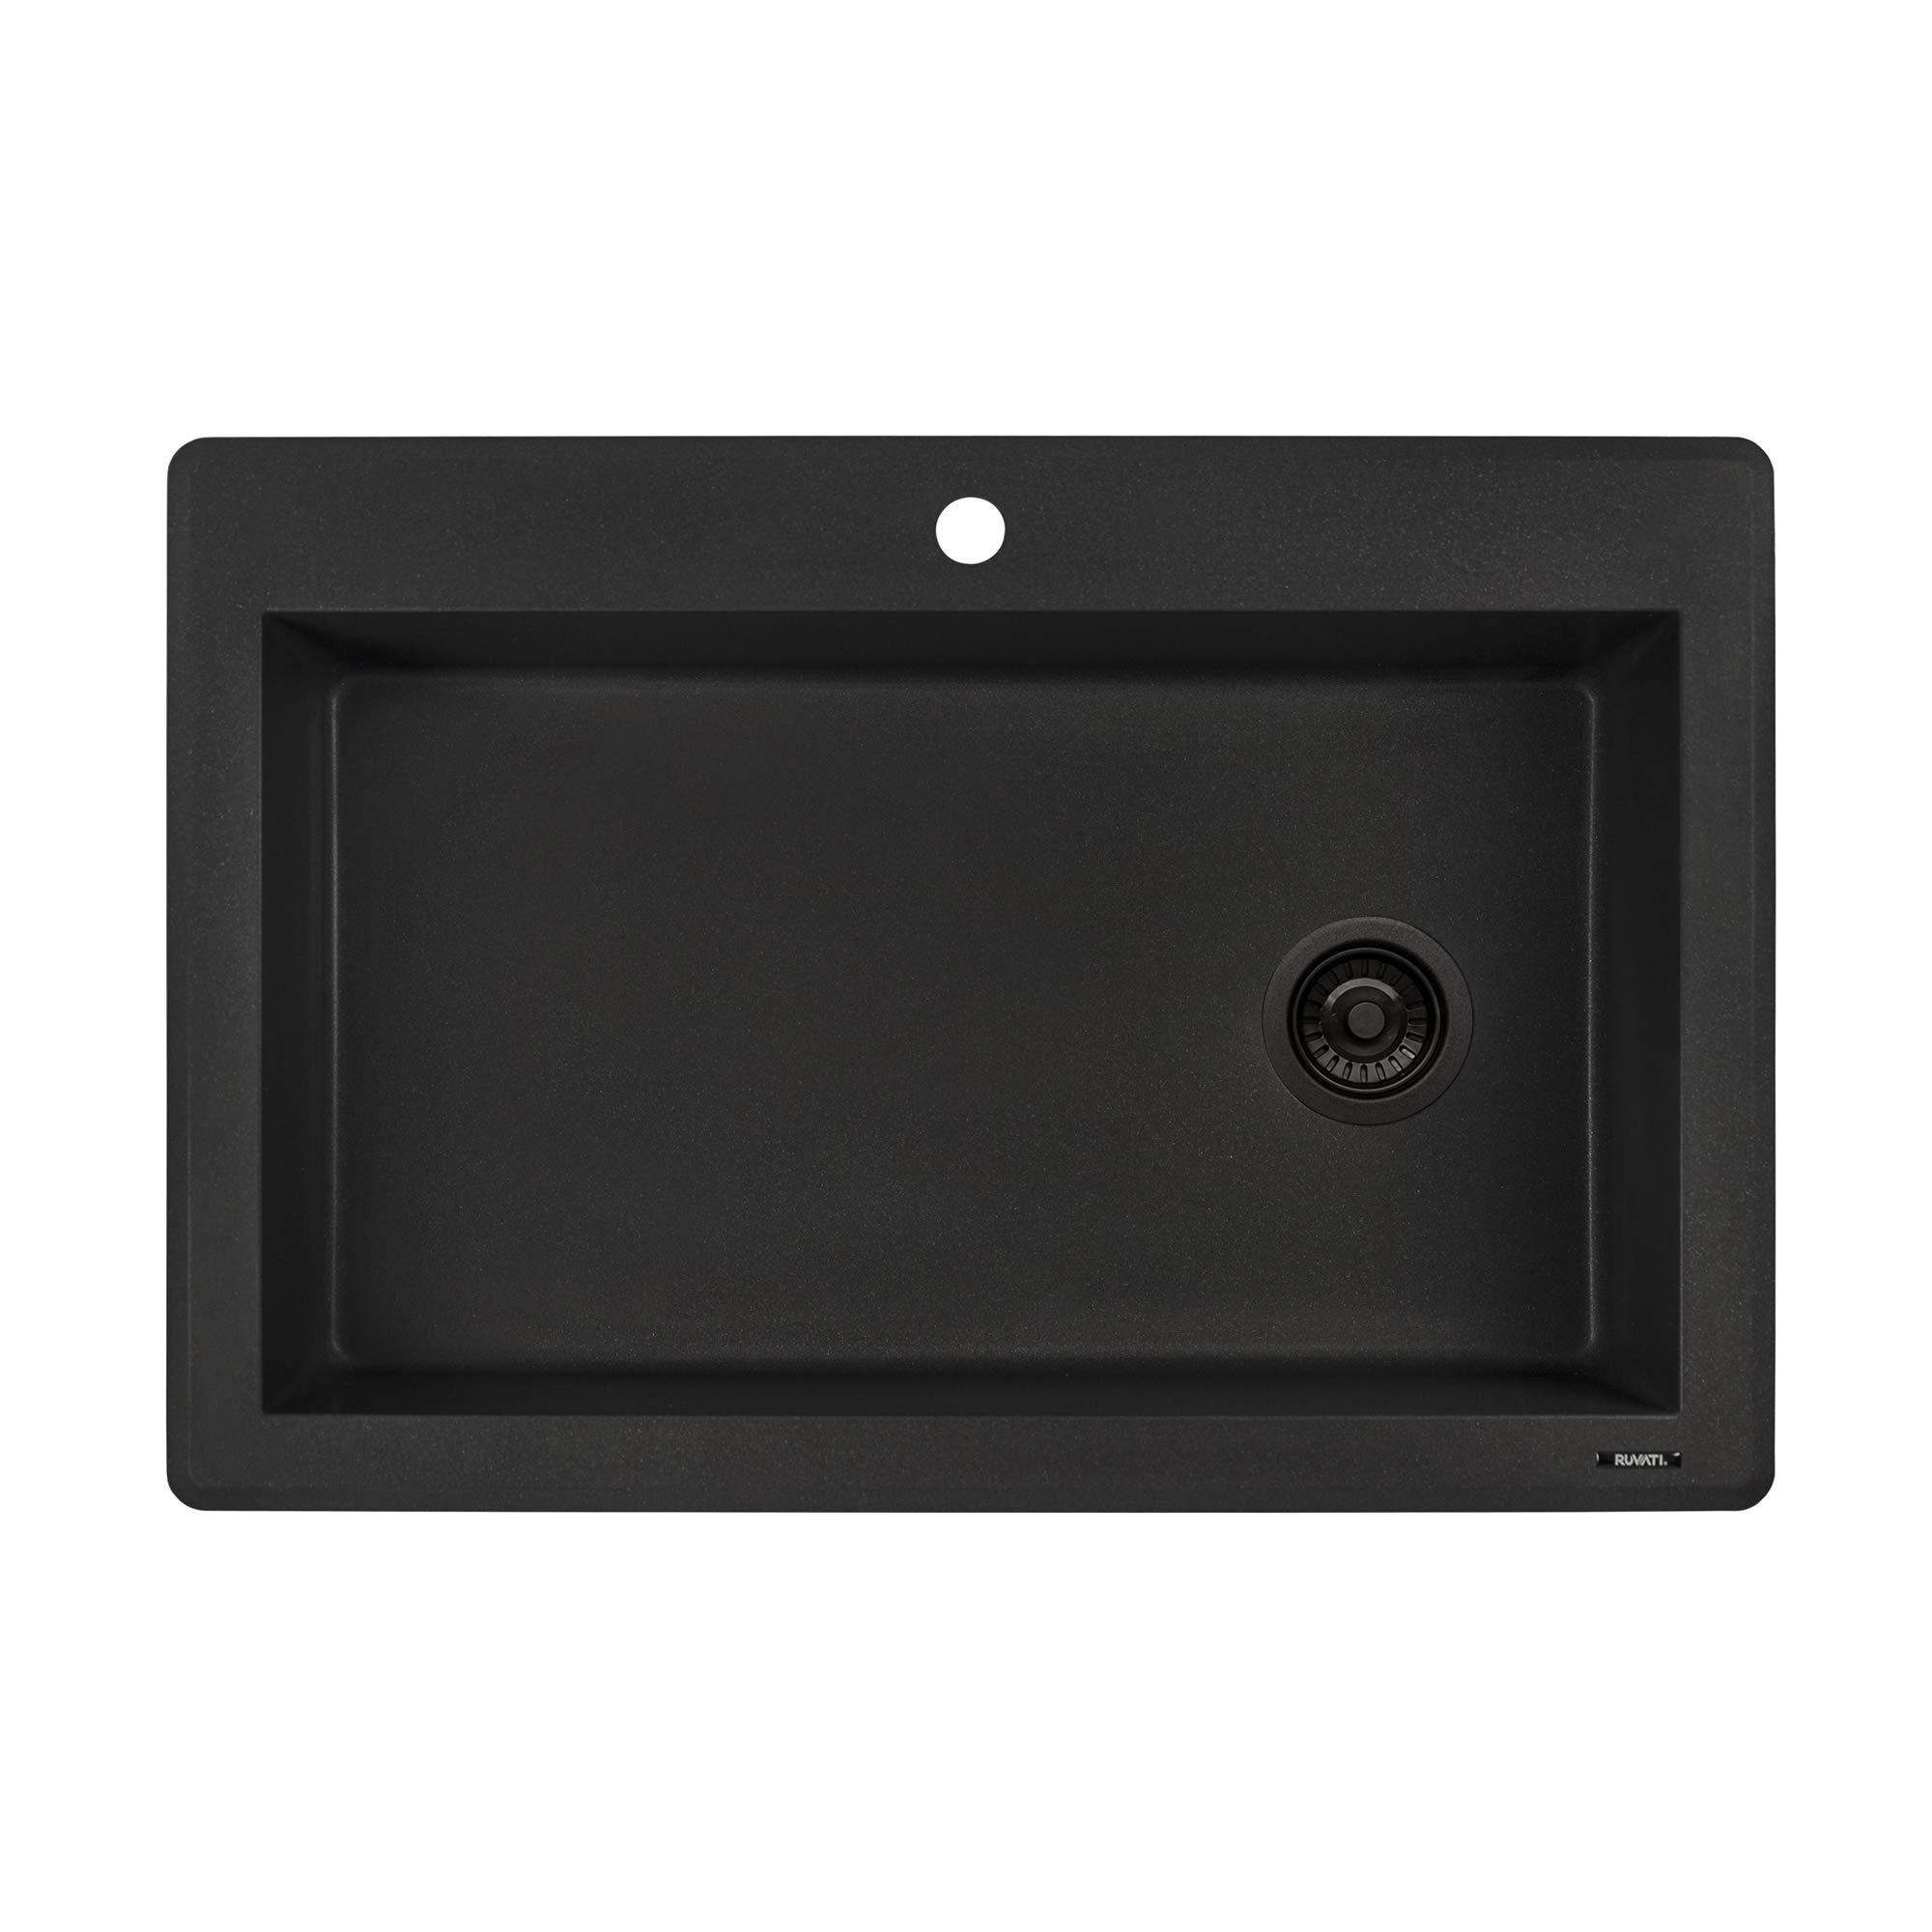 Ruvati 33 x 22 inch Dual-Mount Granite Composite Single Bowl Kitchen Sink - Black Galaxy - RVG1033GX